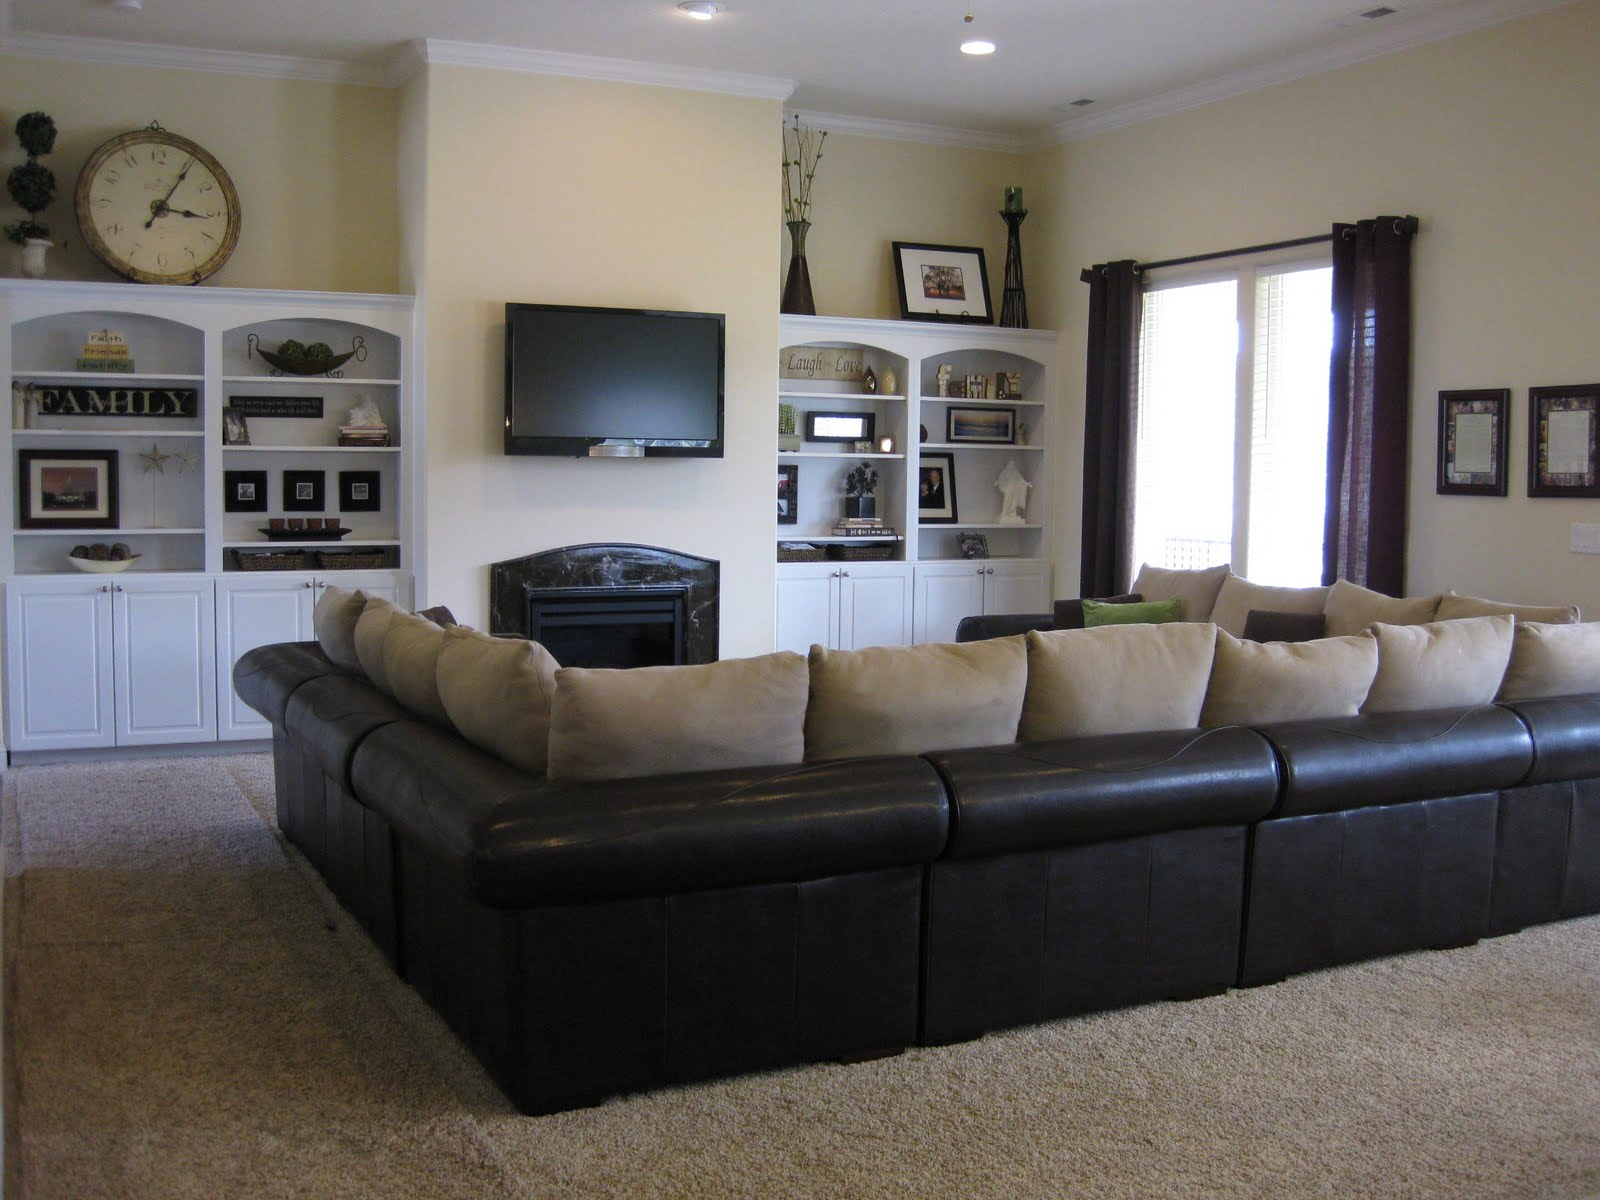 Cottonwood springs home for sale 459 000 for Best carpet for basement family room